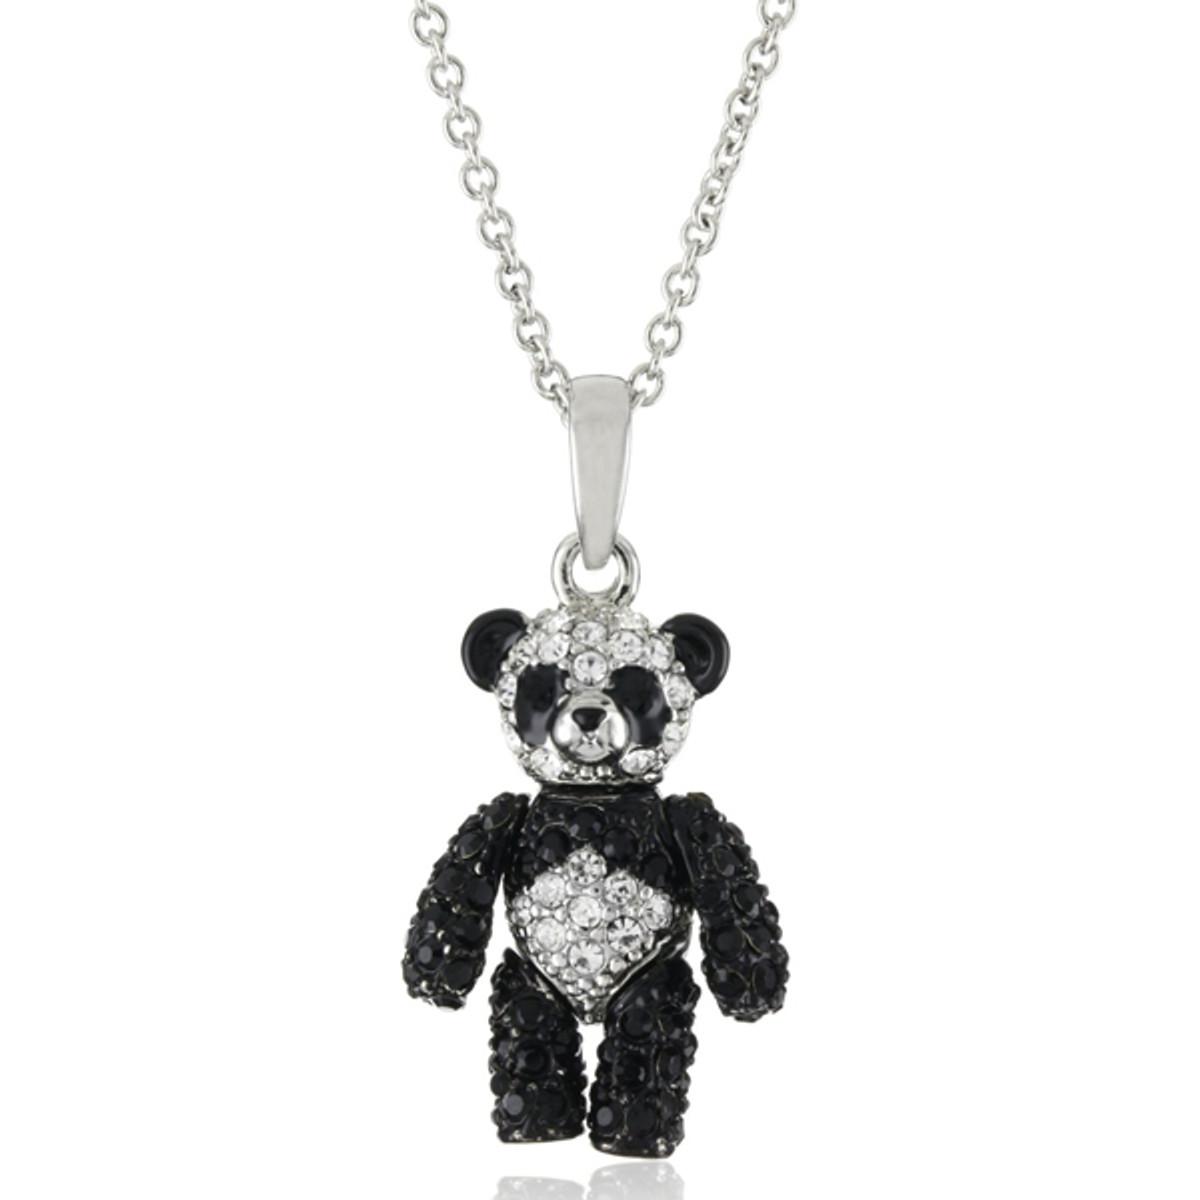 Andrew Hamilton Crawford Jewelry Panda Bear Black Necklace